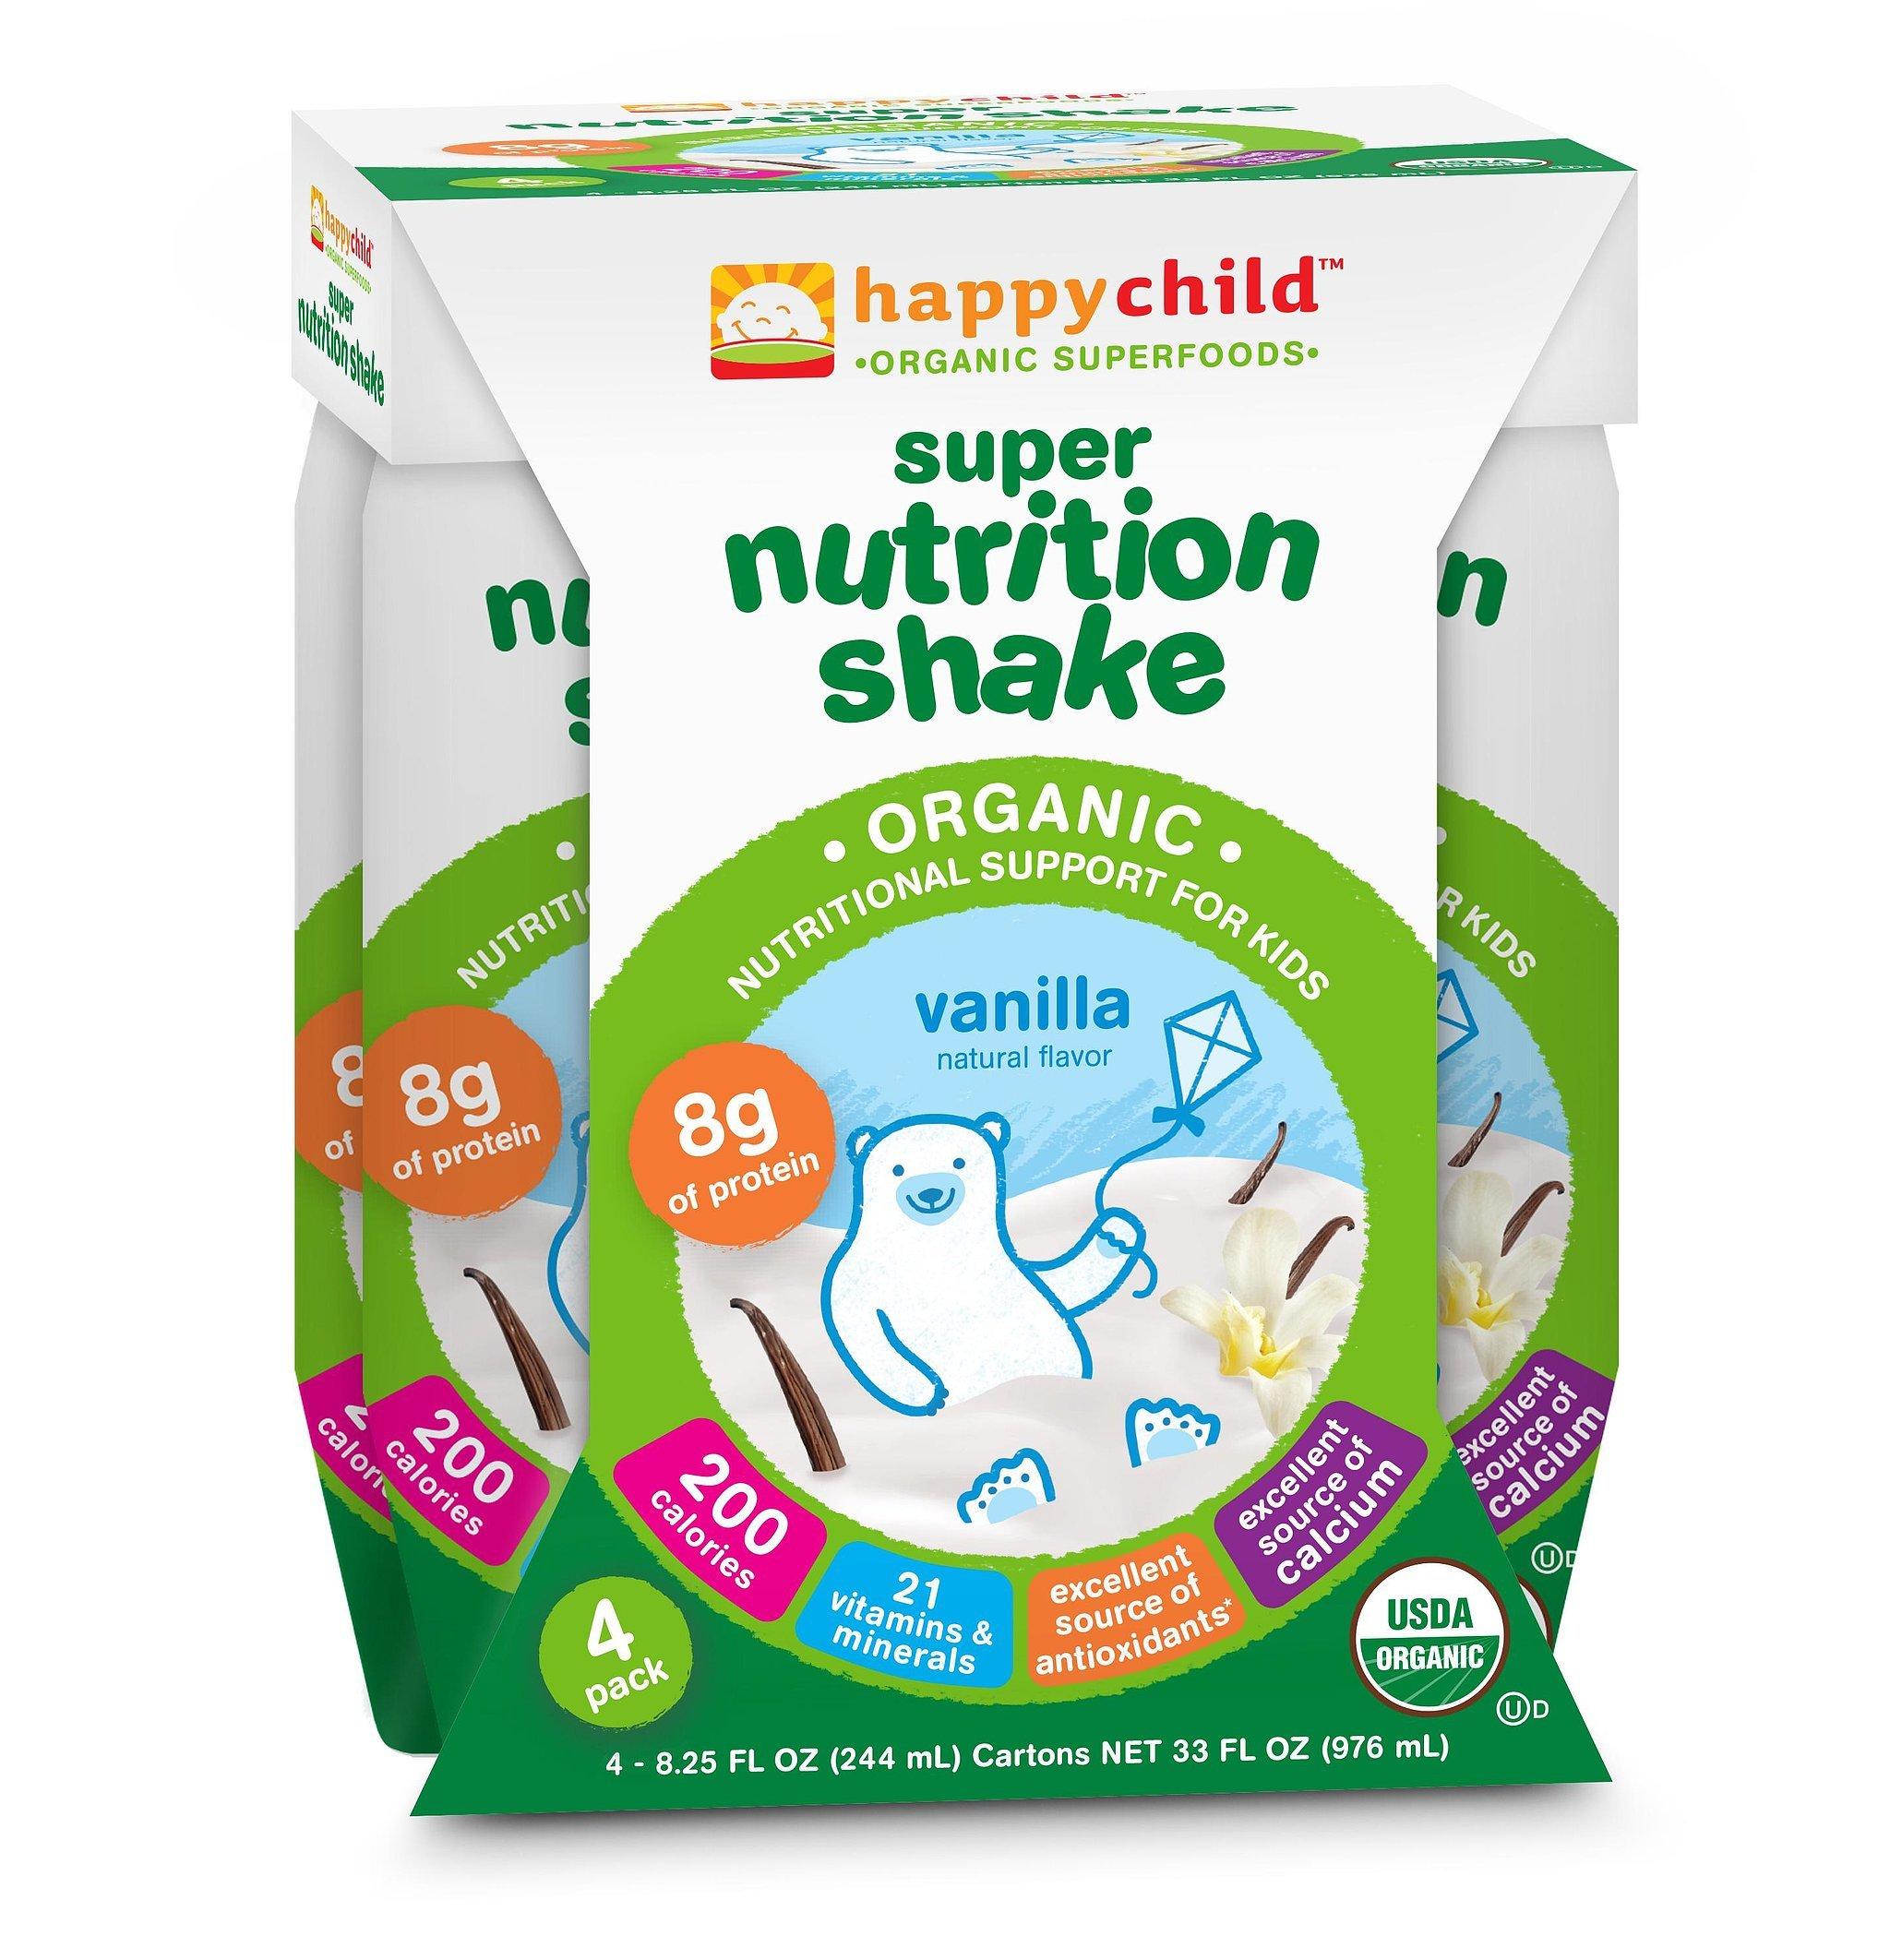 Happy Child Super Nutrition Shake